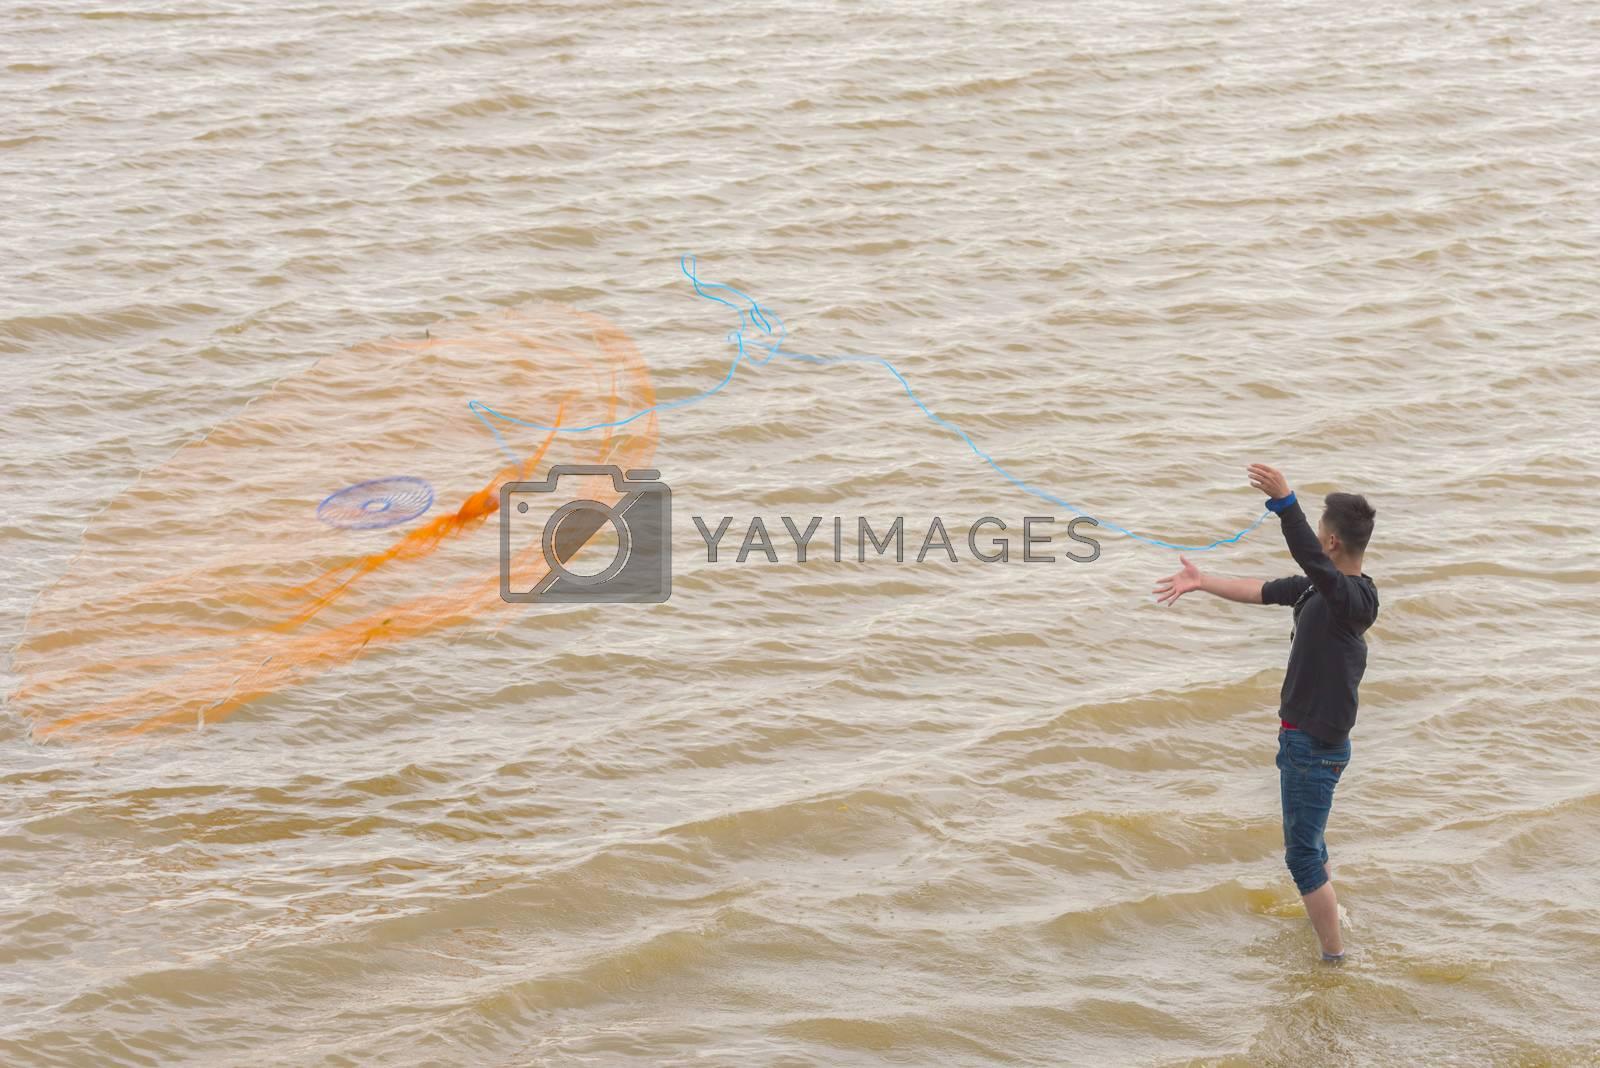 Asian fisherman casting a net for catching freshwater fish. Fisherman on the river. Fishing on the lake. Fishing net